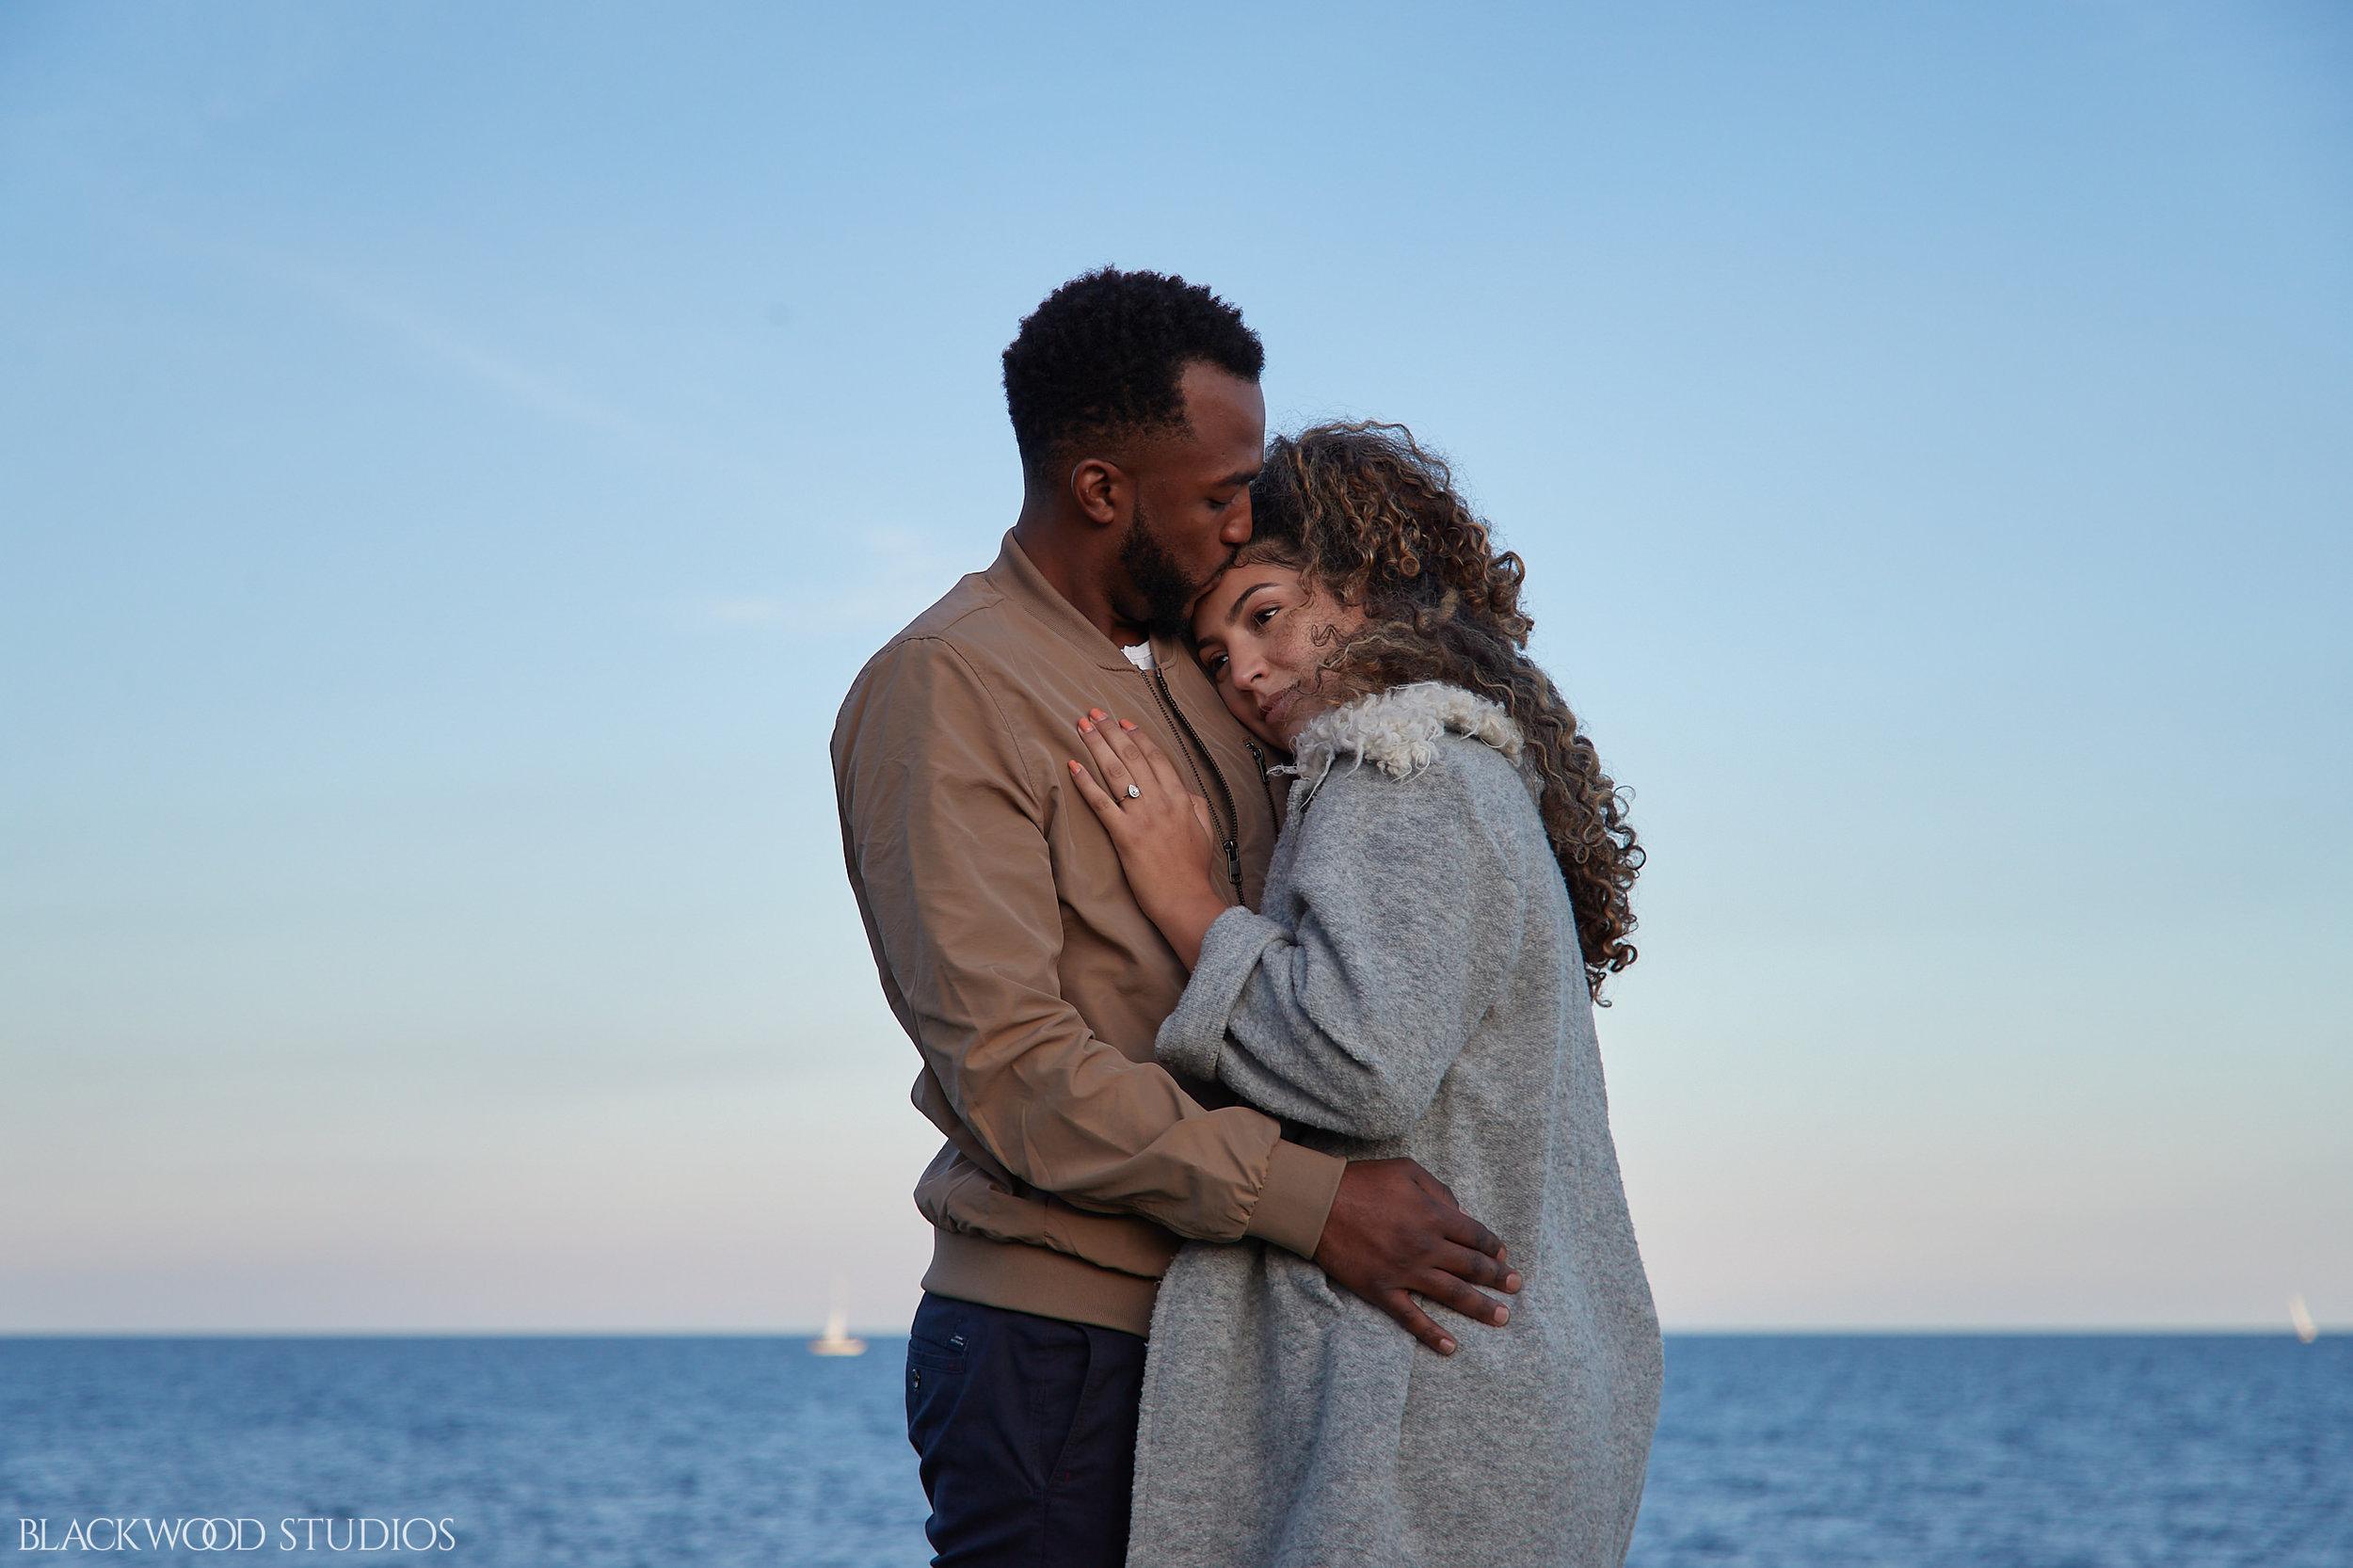 Blackwood-Studios-20181014-181006-Nader-and-Rayane-Engagement-photography-Lakeside-Park-Oakville-Ontario-Canada.jpg